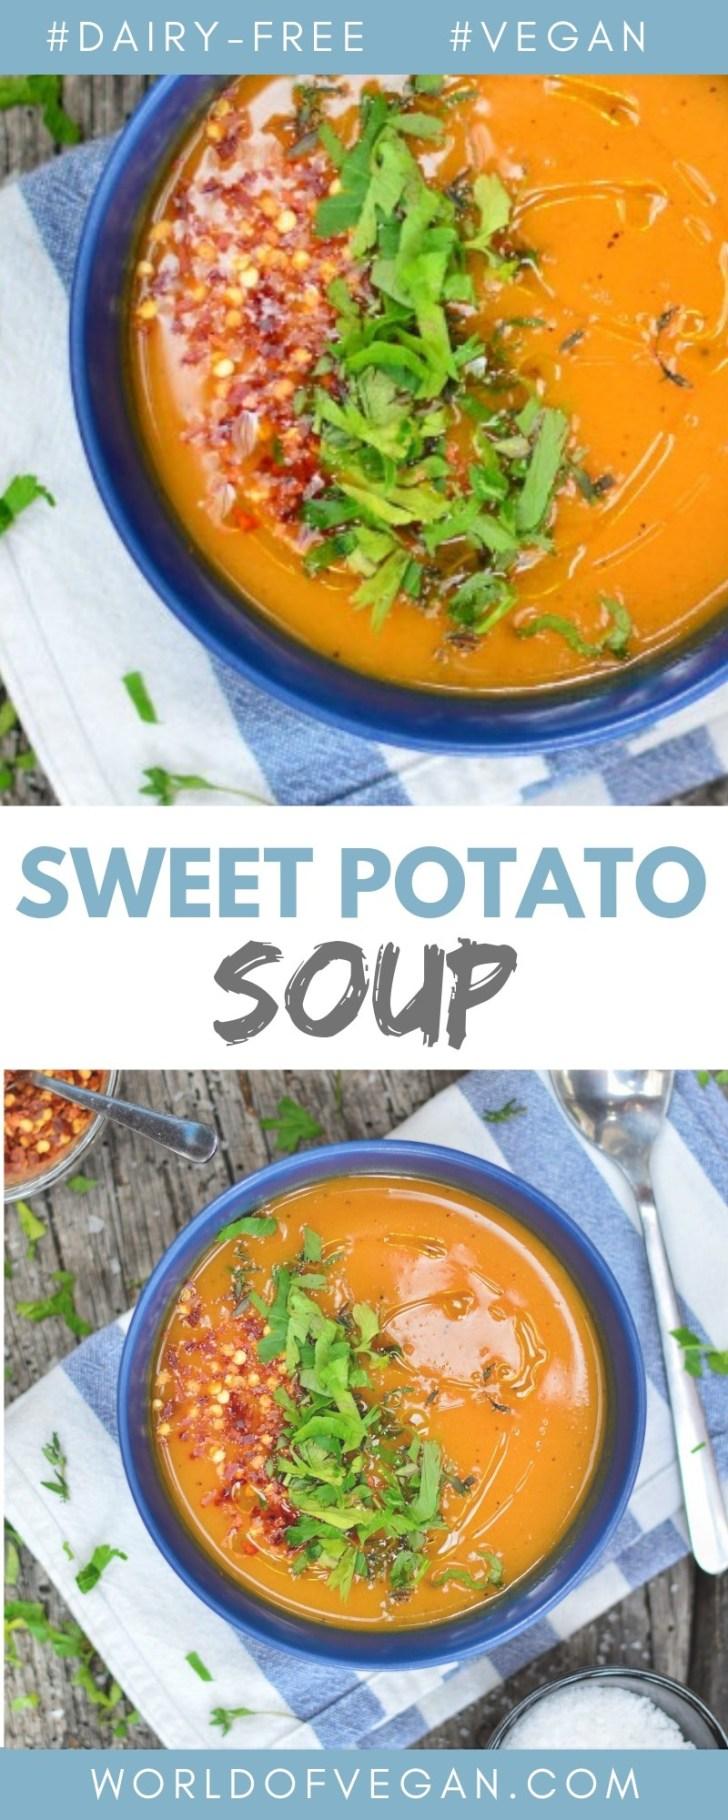 One-Pot Sweet Potato Soup   Easy Vegan Dinner Recipe   World of Vegan   #sweetpotato #soup #healthy #easy #onepot #worldofvegan